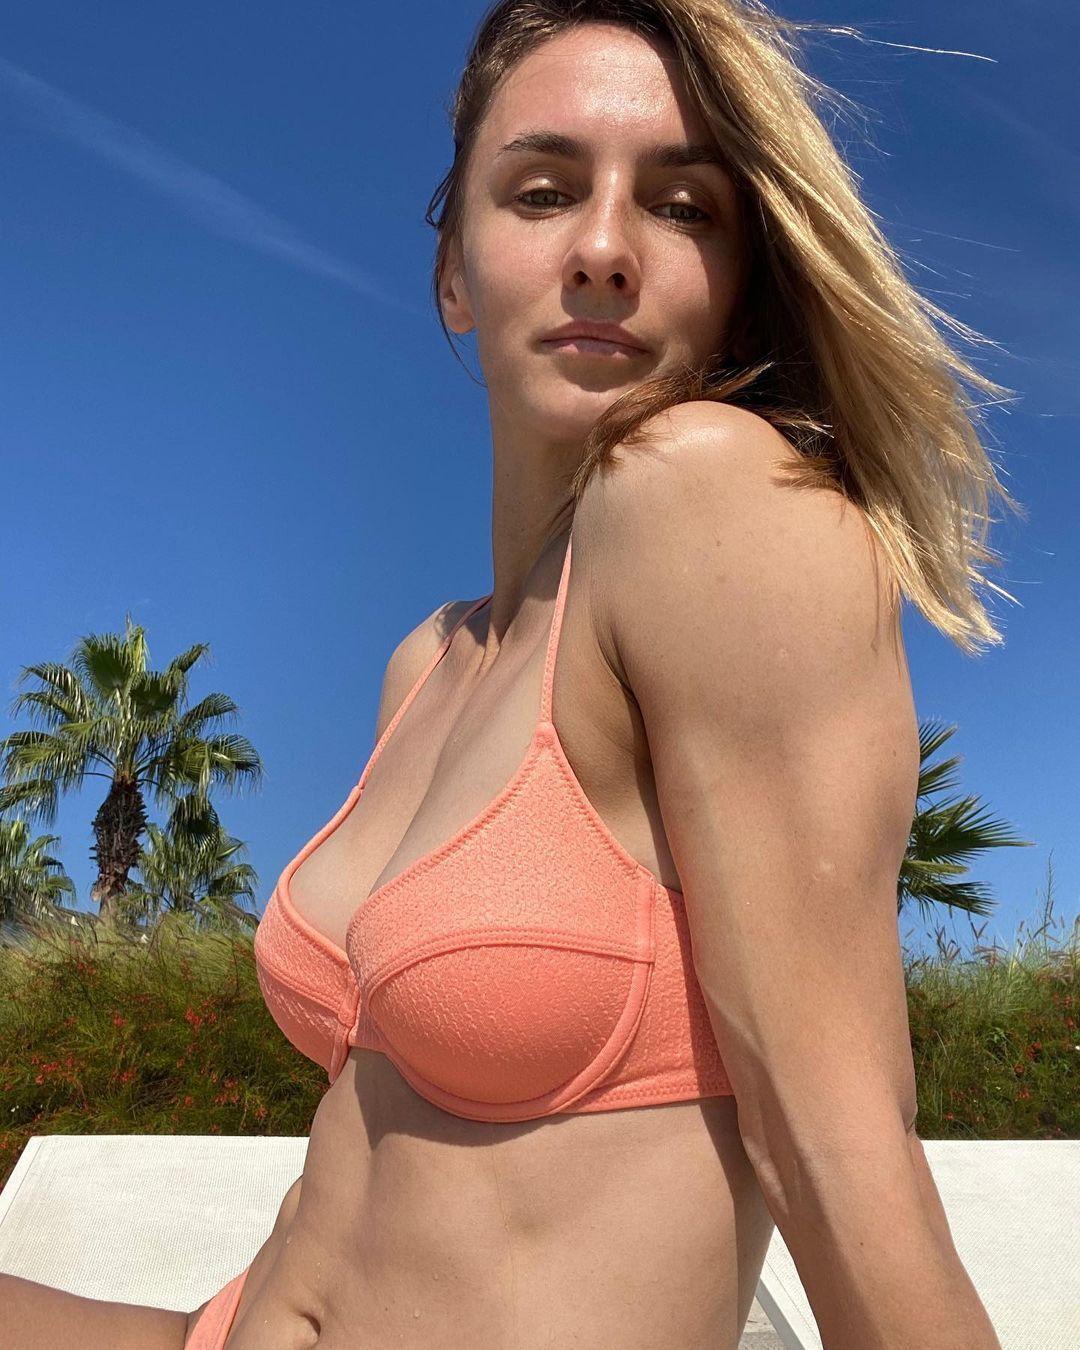 Леся Цуренко в рожевому купальнику